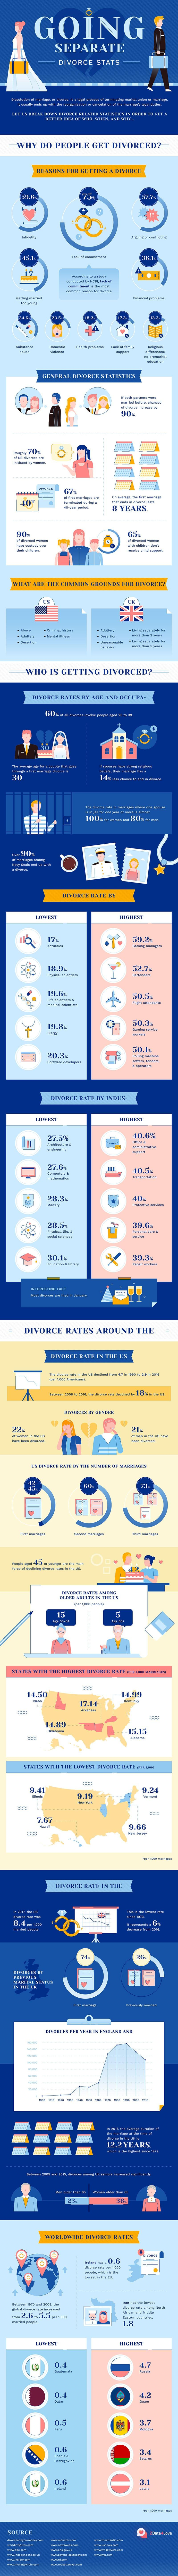 Divorce-Statistics-Infographic-1